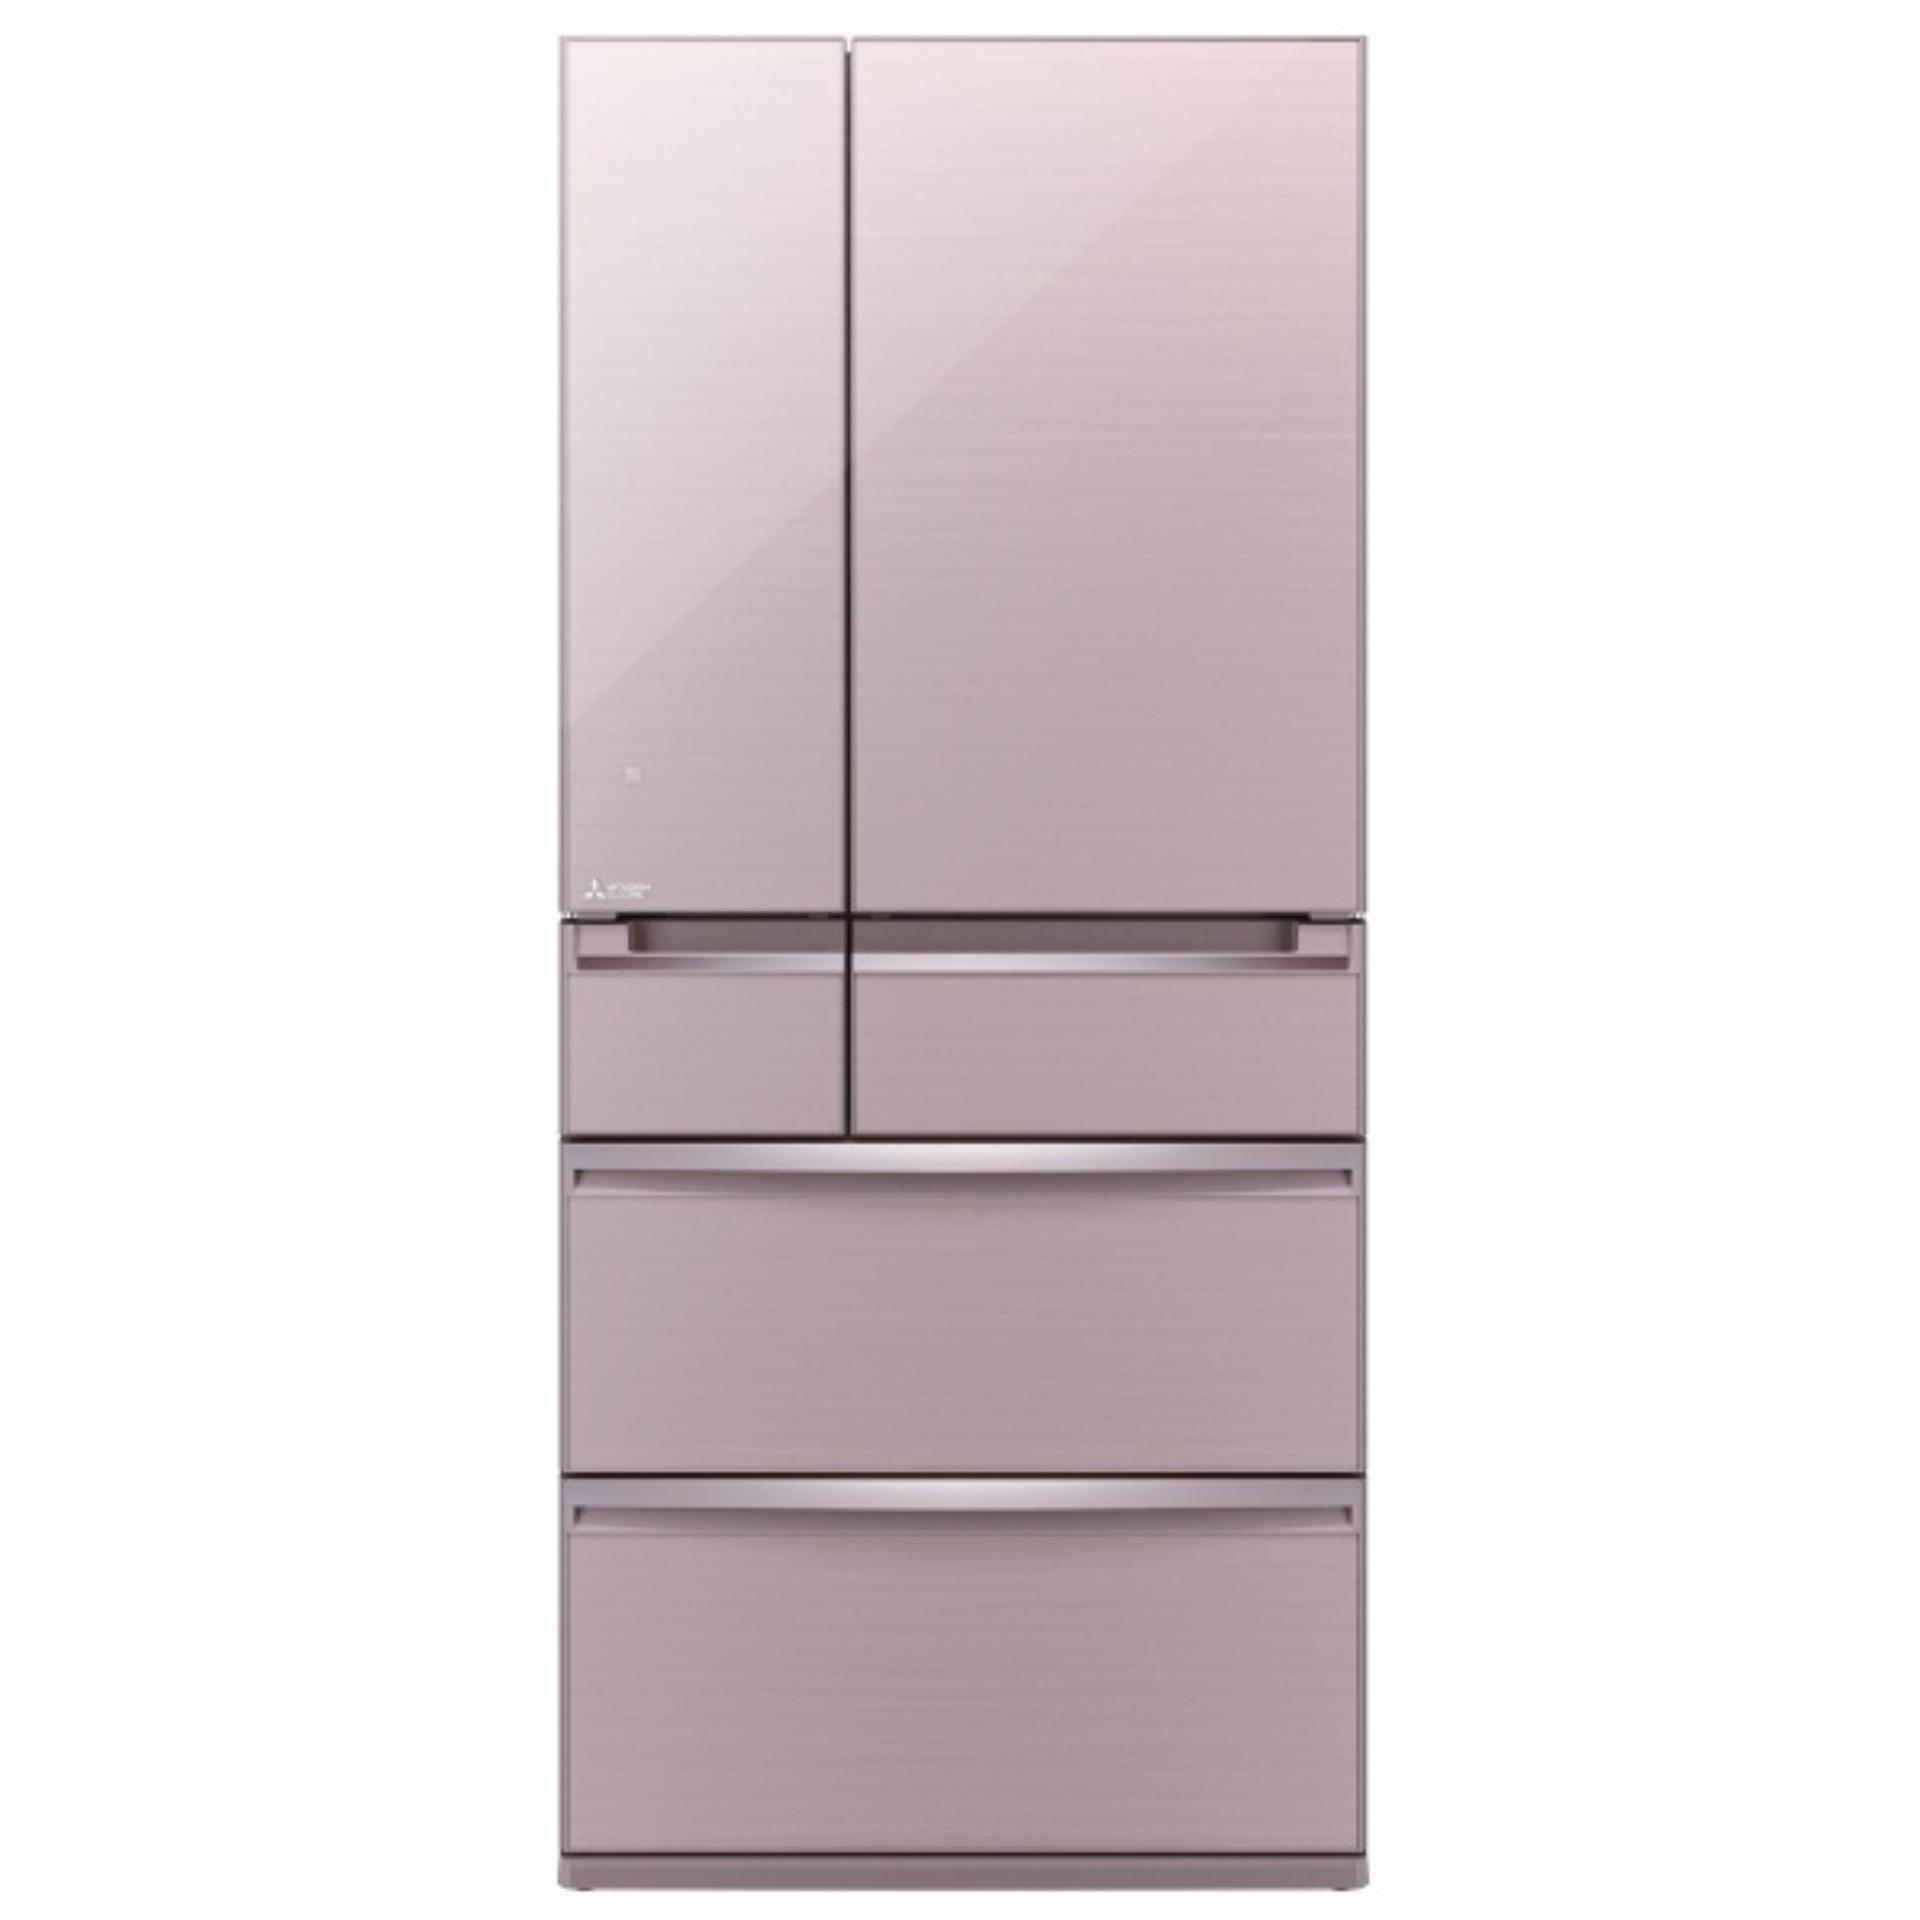 Tủ lạnh Mitsubishi MR-WX71Z